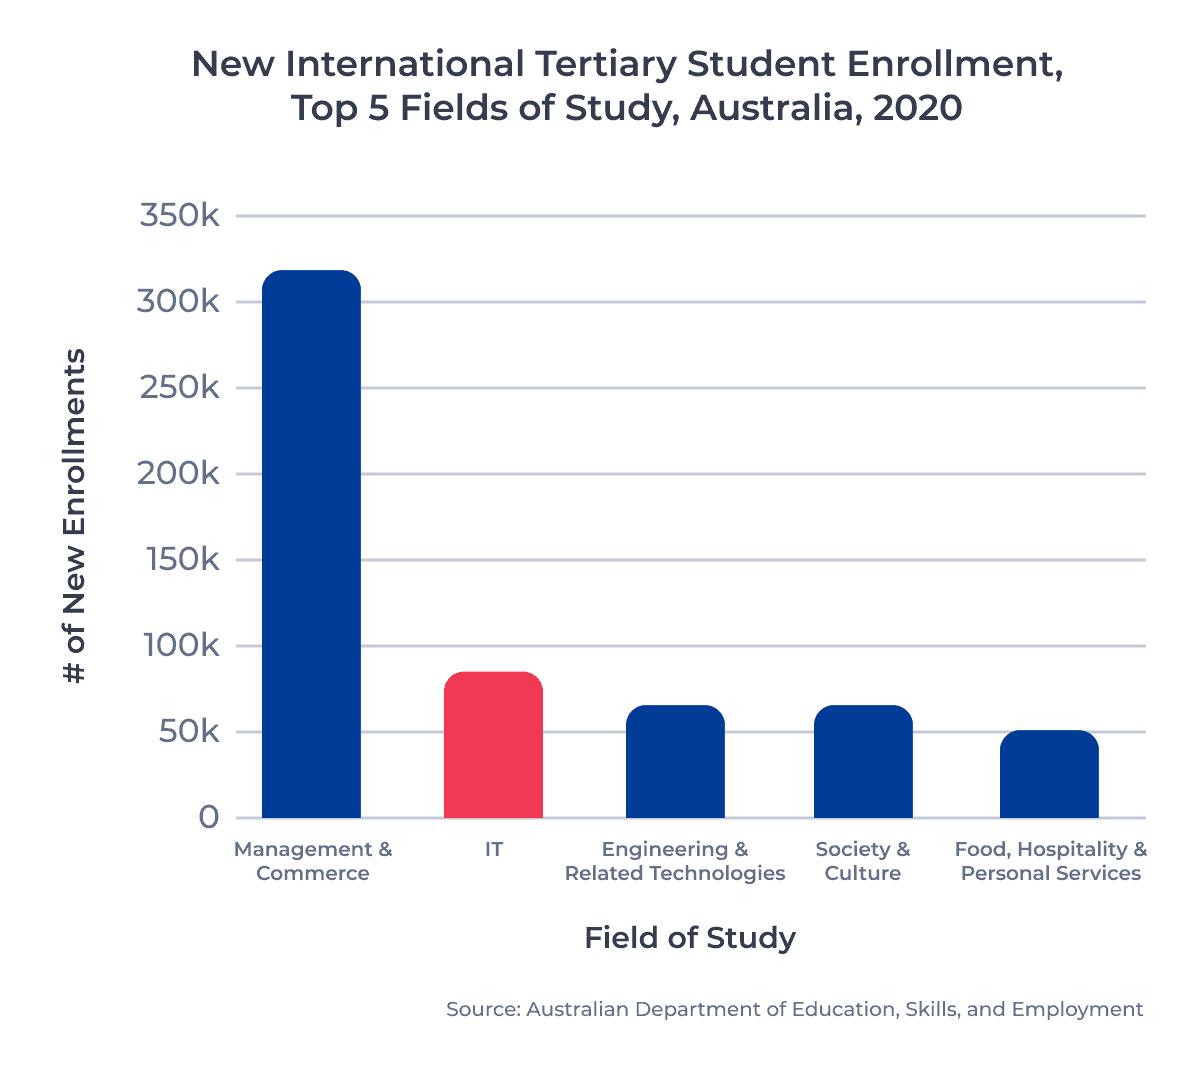 New International Tertiary Student Enrollment, Top 5 Fields of Study, Australia, 2020